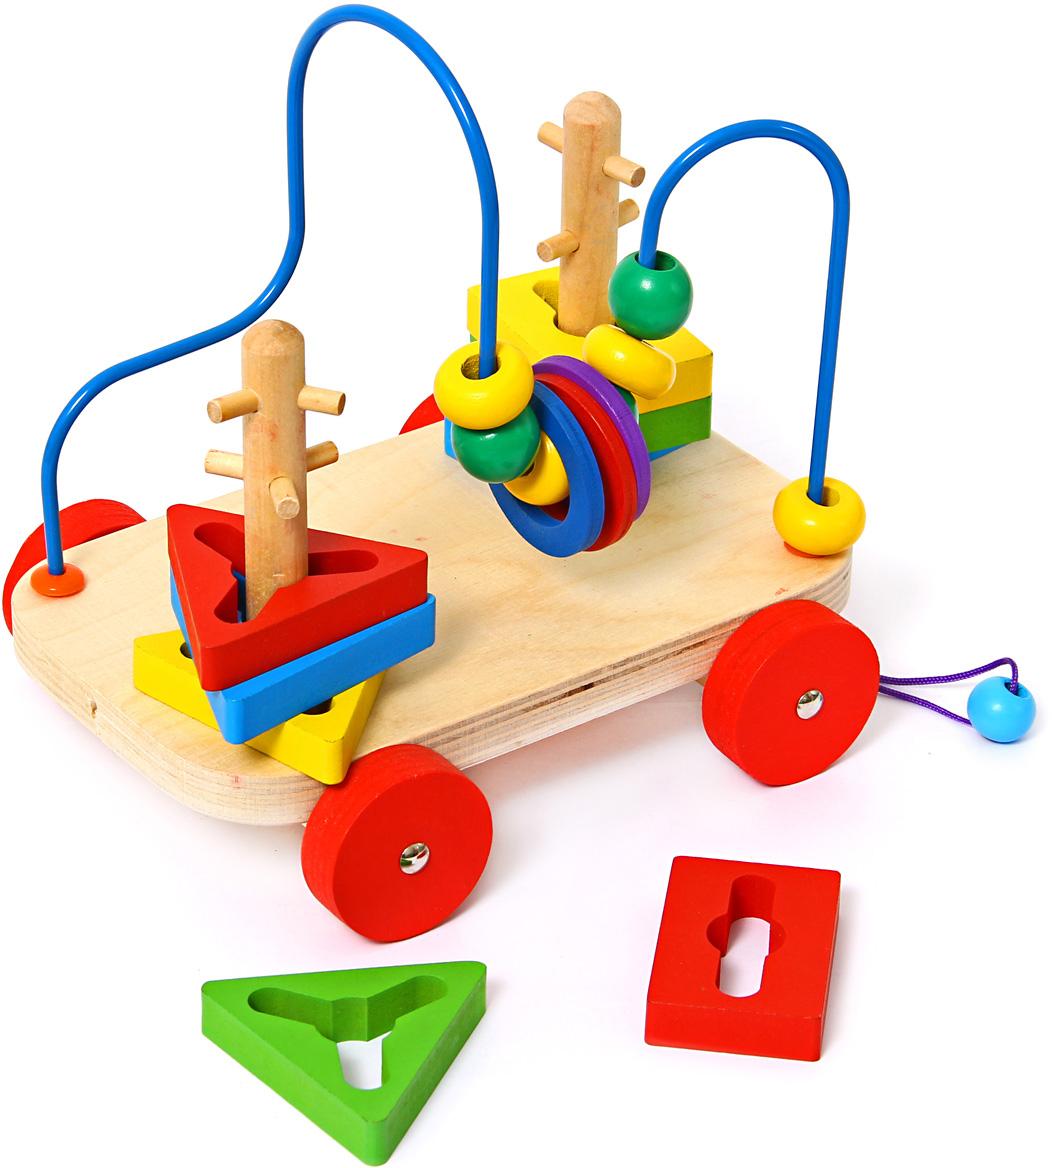 Фабрика Фантазий Лабиринт-Каталка Яркие цвета 52862 деревянные игрушки фабрика фантазий сортер бабочка